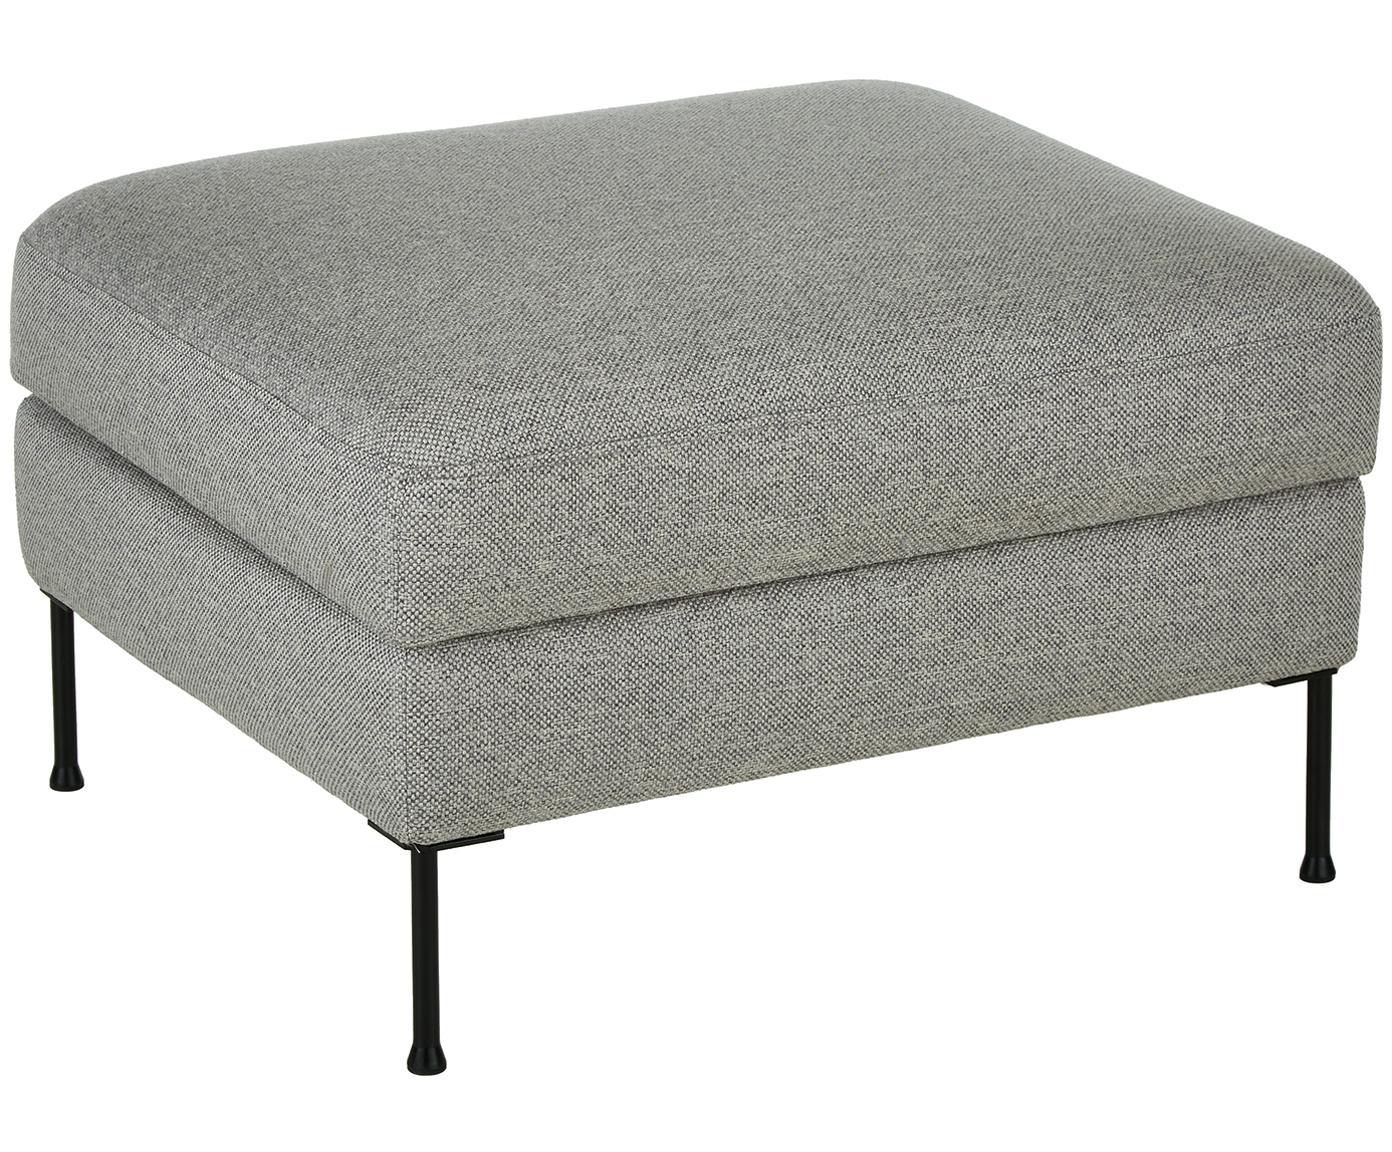 Sofa-Hocker Cucita mit Stauraum, Bezug: Webstoff (Polyester) 45.0, Gestell: Massives Kiefernholz, Hellgrau, 85 x 42 cm